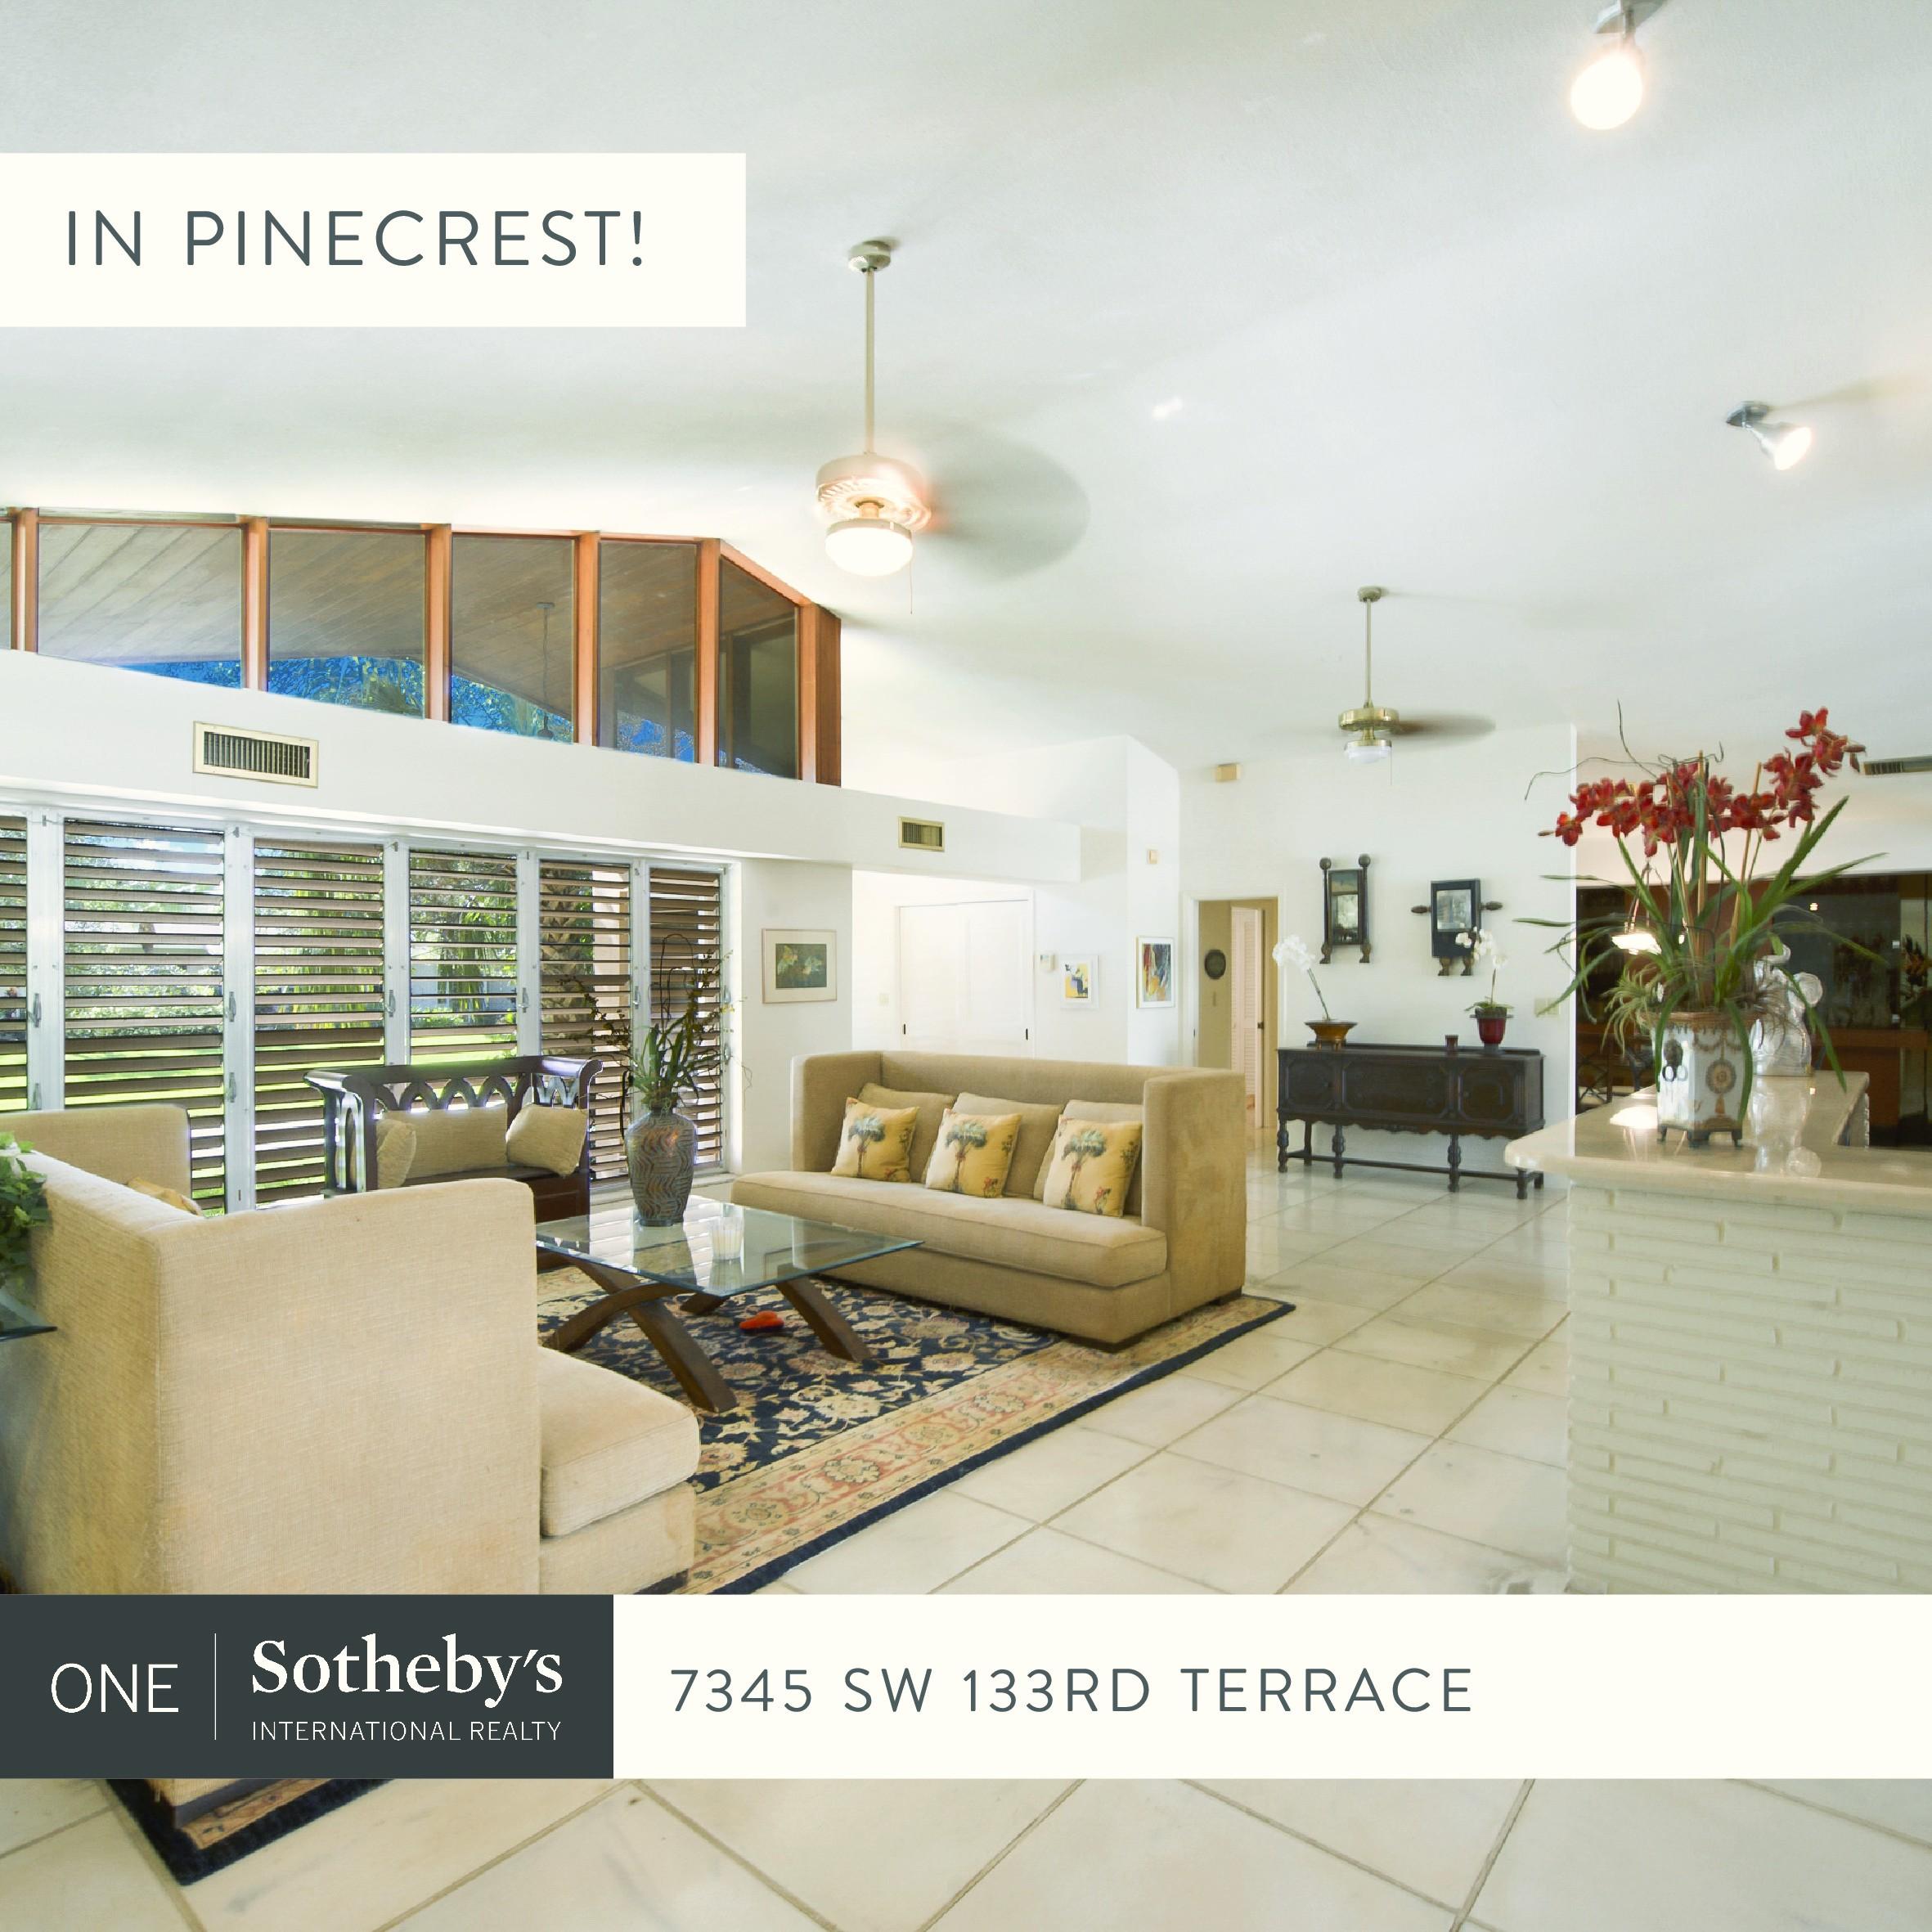 7345 SW 133 Terrace, Pinecrest FL